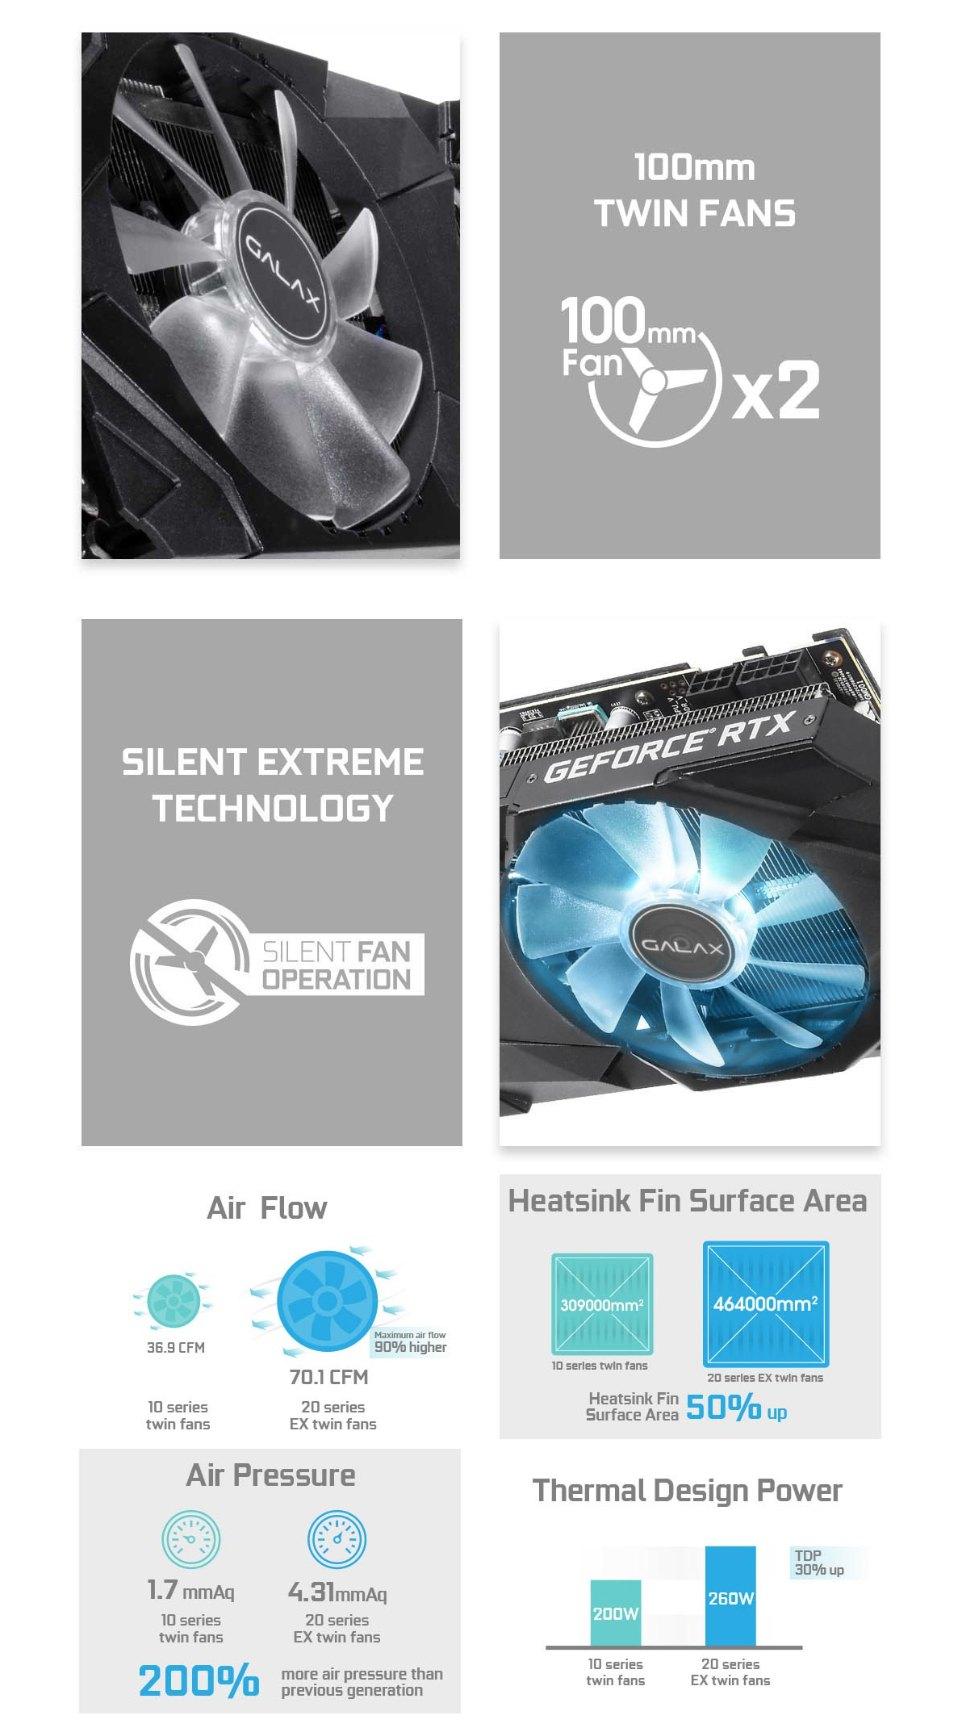 Galax GeForce RTX 2070 Super EX OC 8GB features